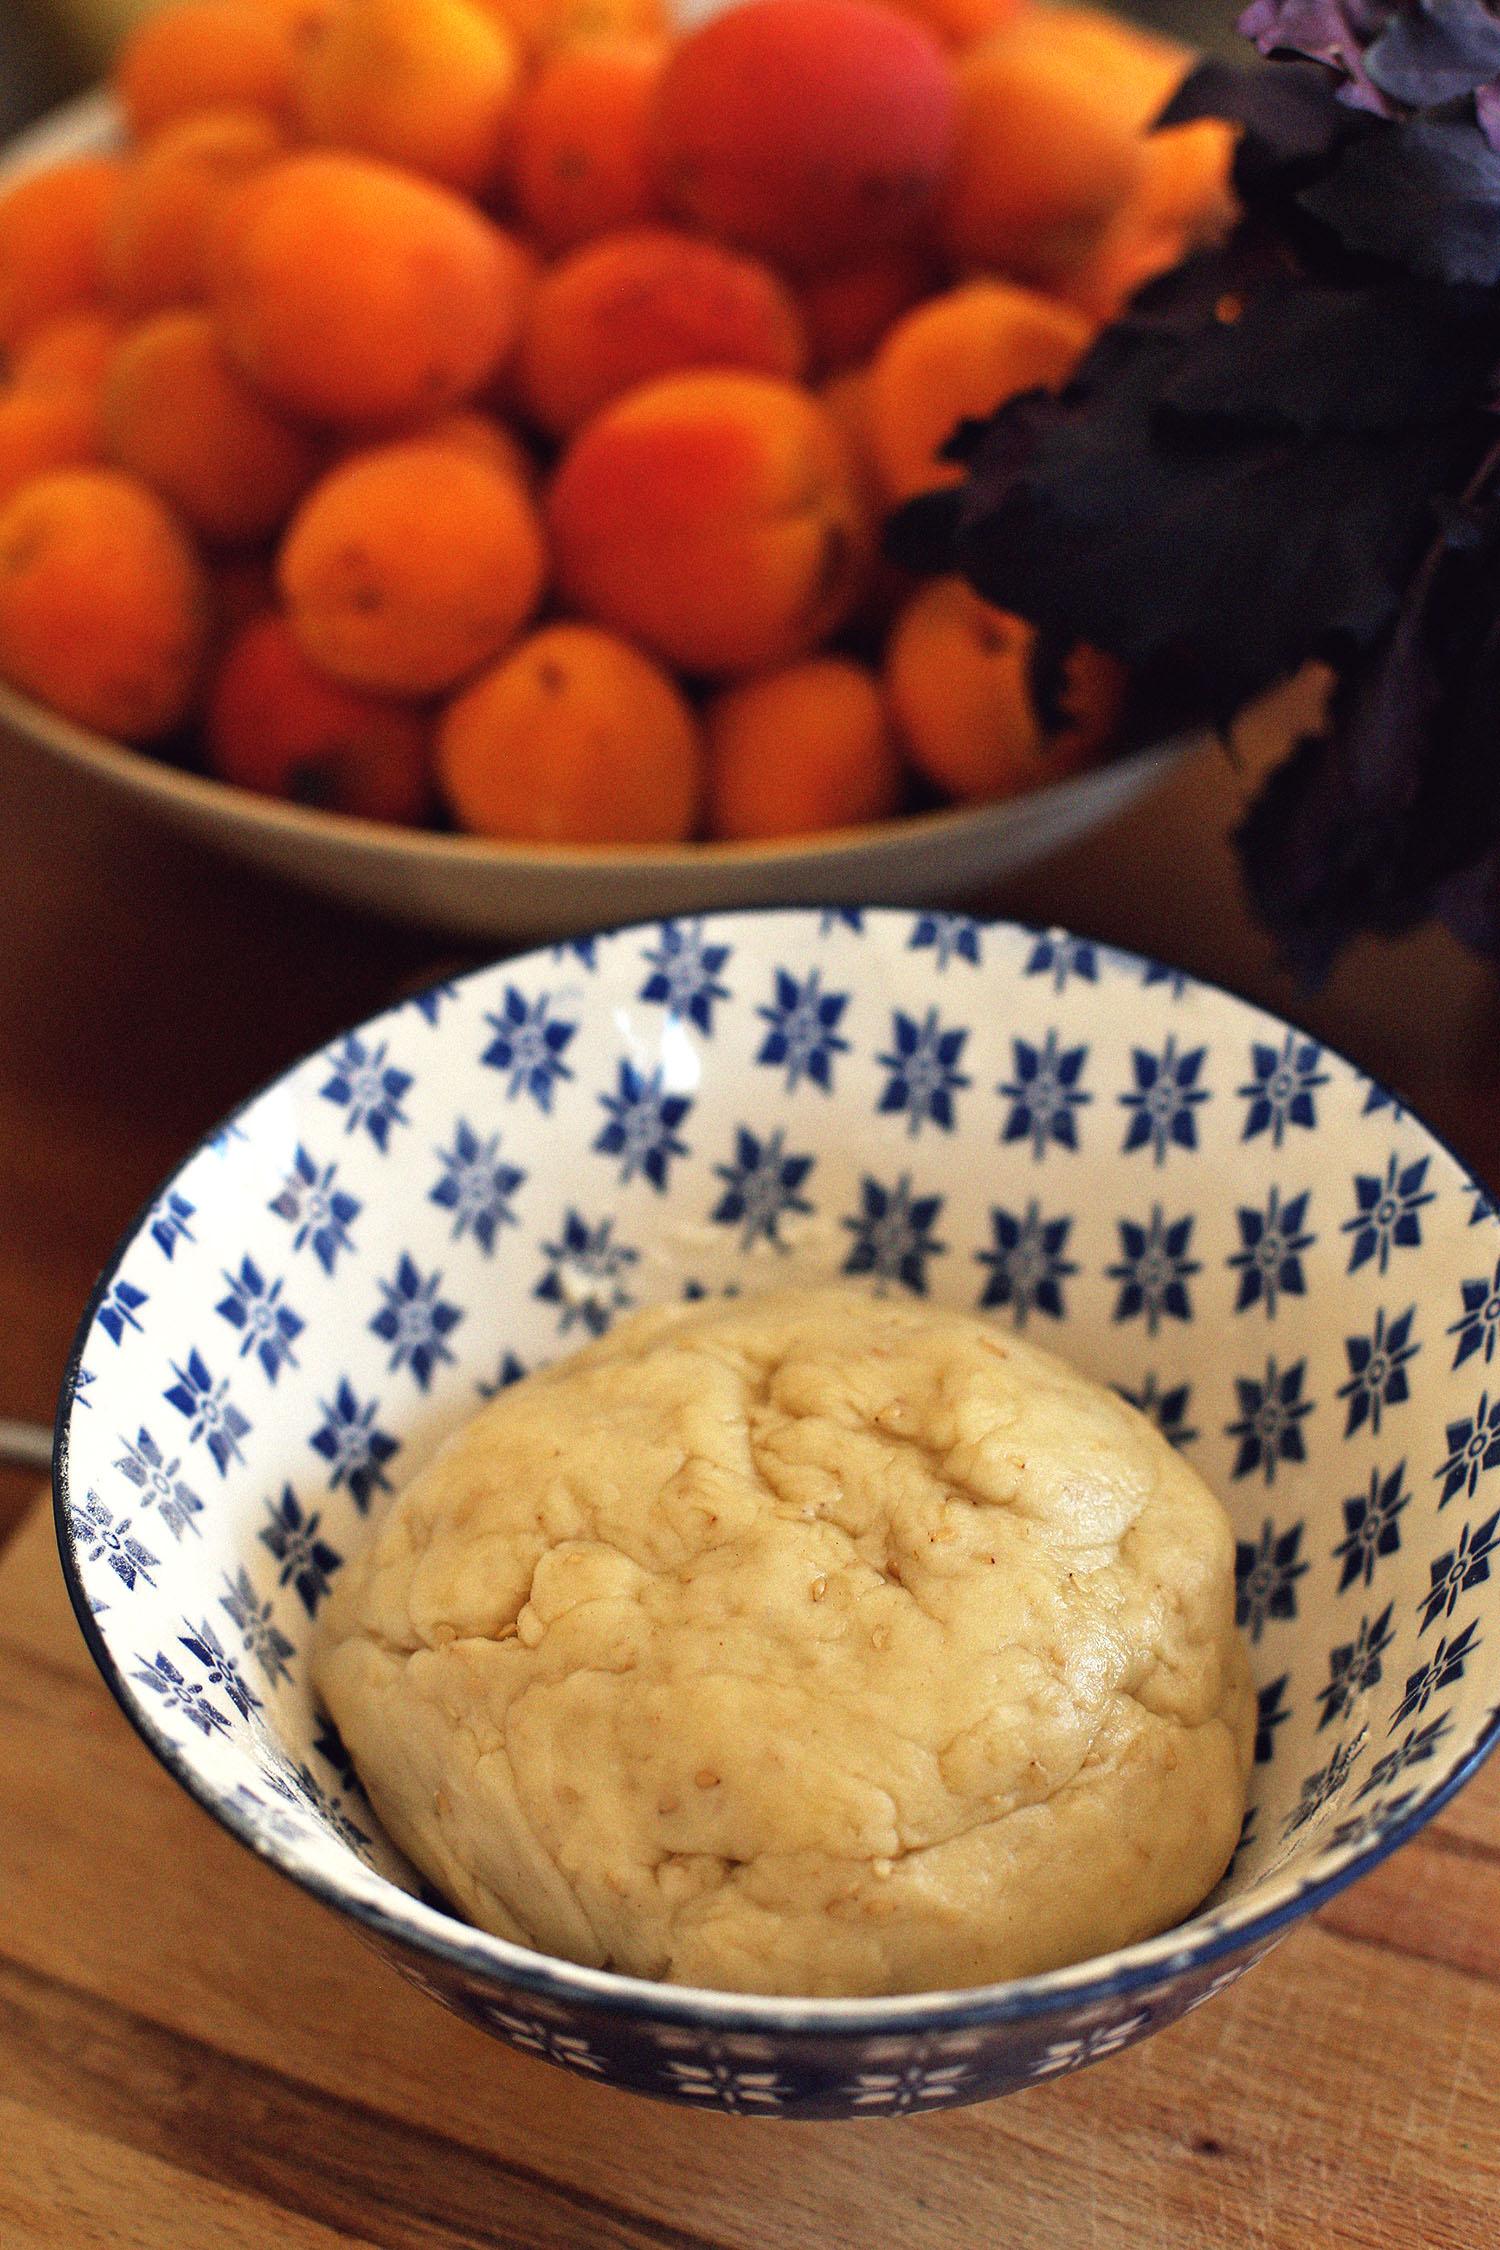 lady-biche-blog-recette-tarte-abricot-6